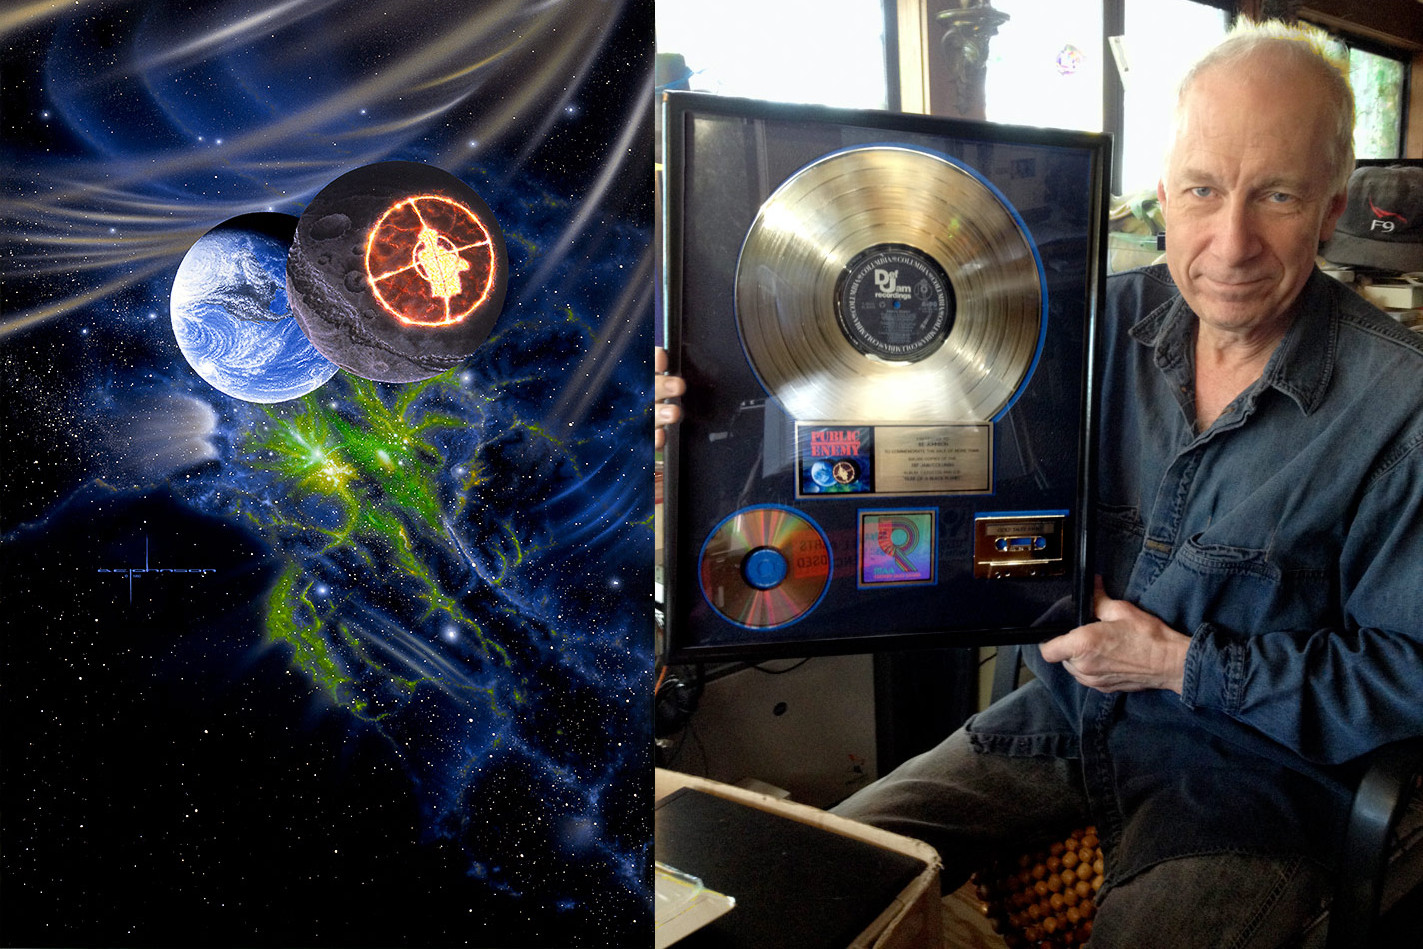 public enemy undercover supreme fear of a black planet album artwork be johnson